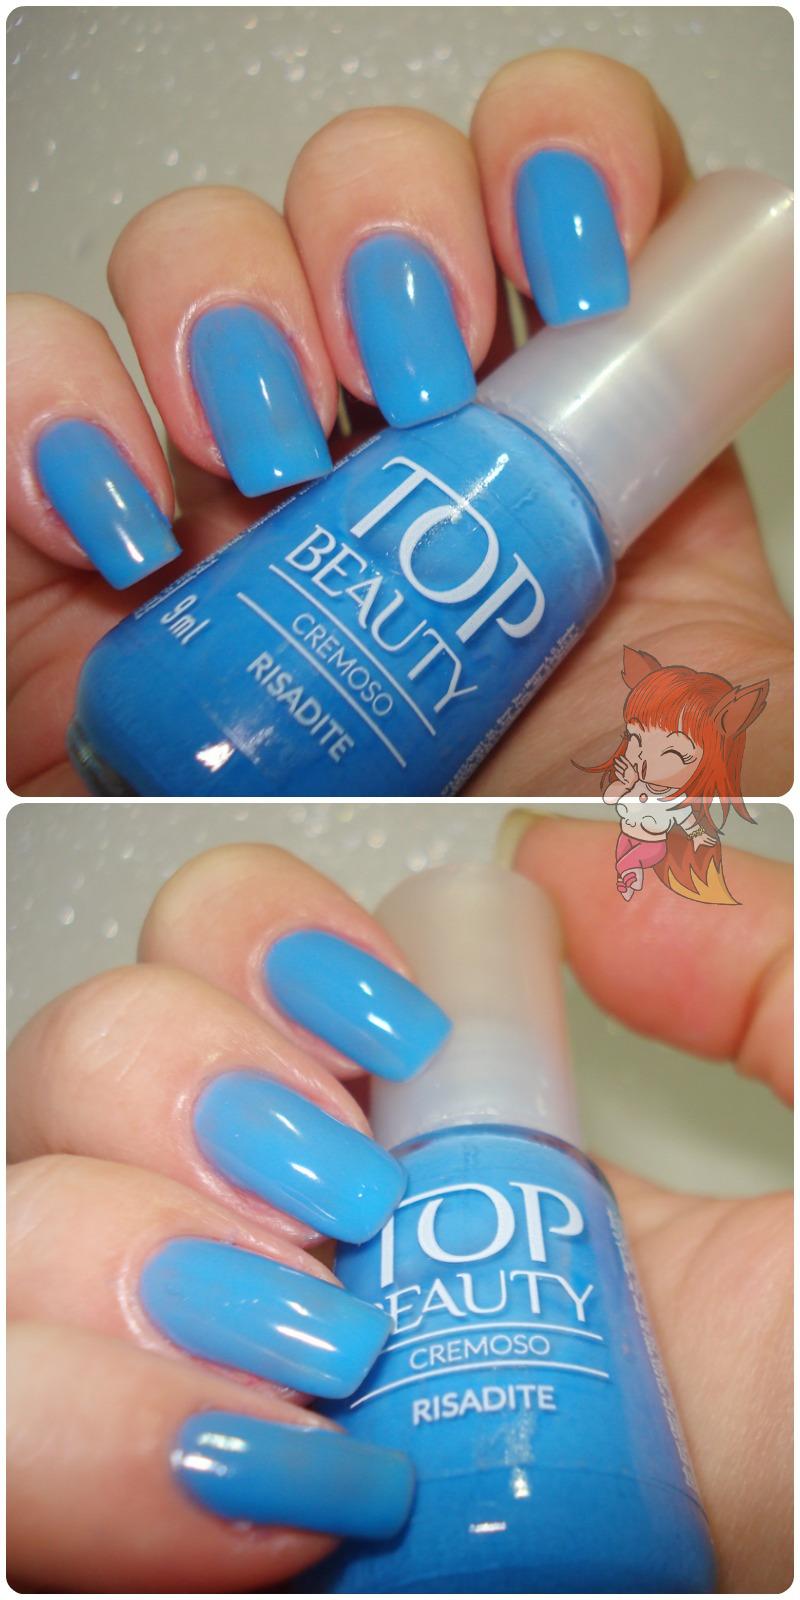 Esmalte Risadite :: Top Beauty - Novembro Azul - Resenha